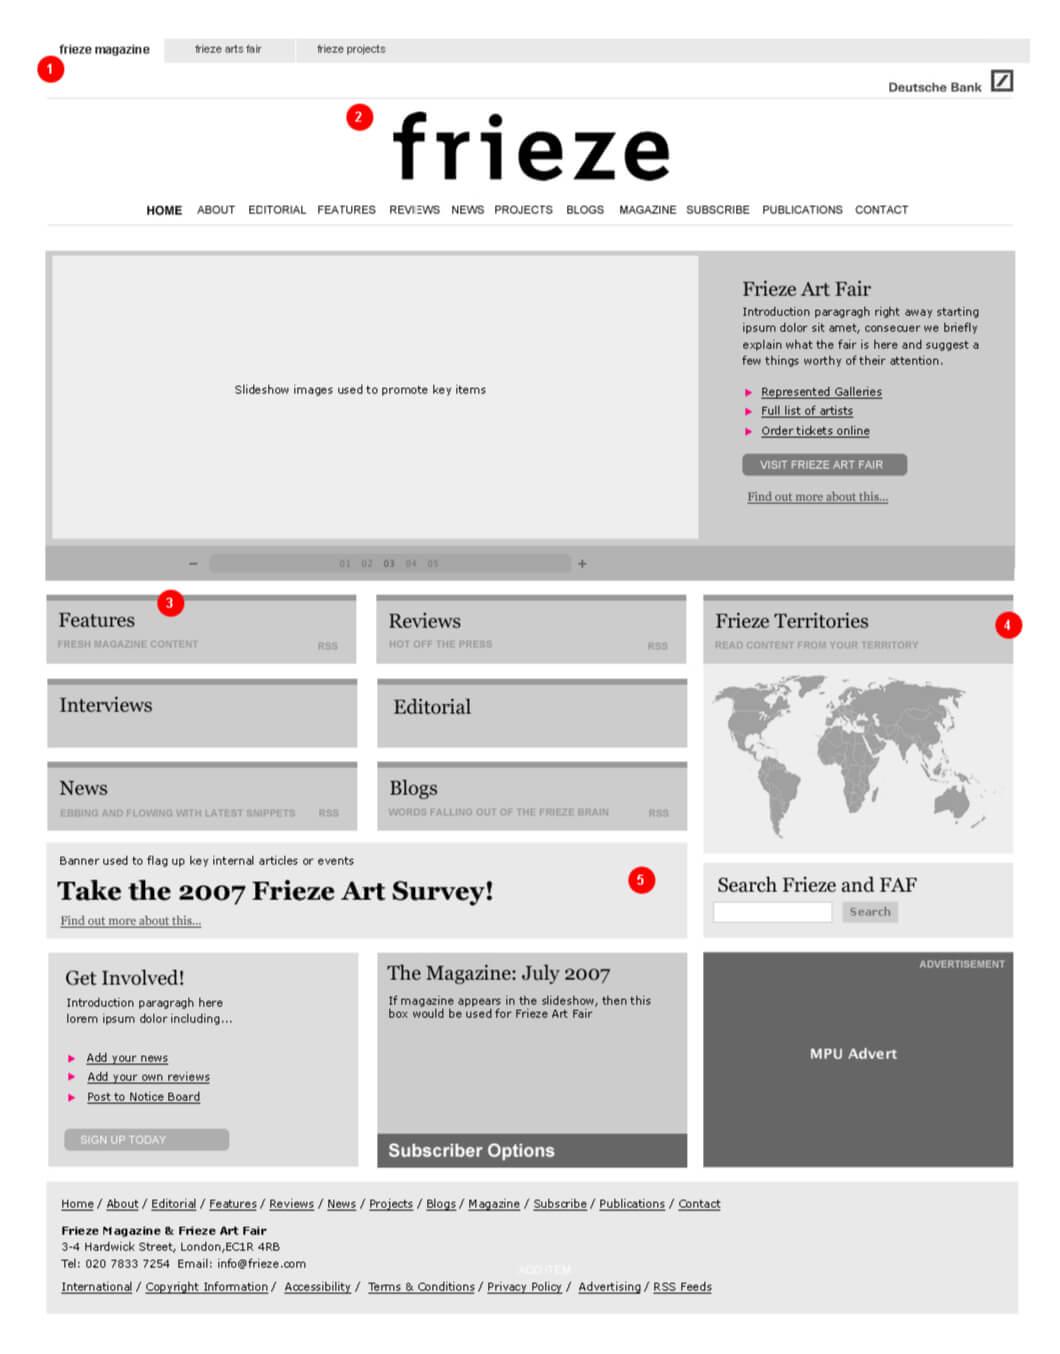 High-level wireframing for Frieze magazine